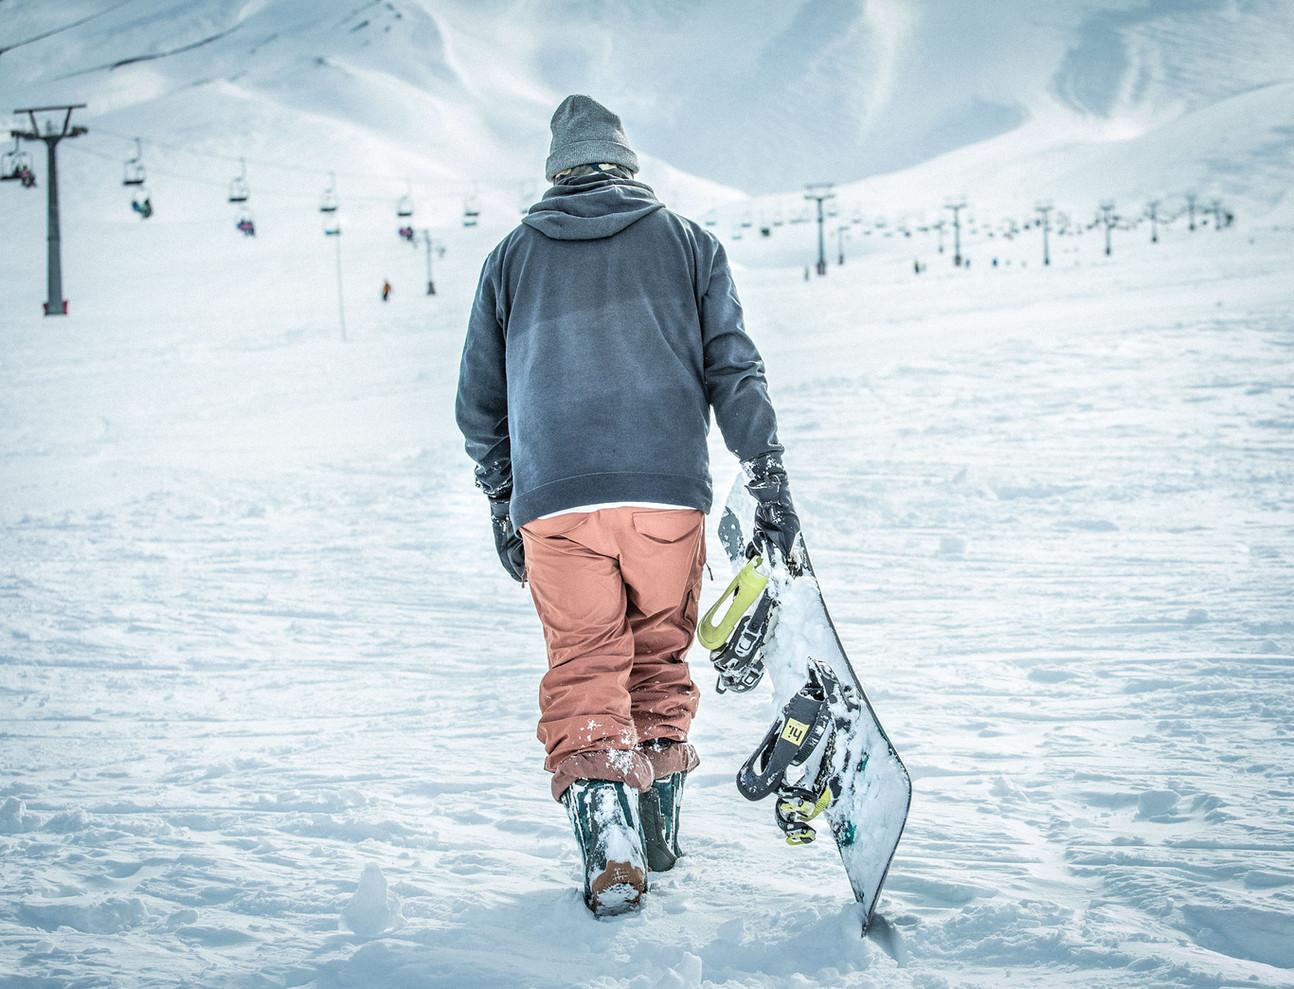 Snowboard - Chile - Mountain -